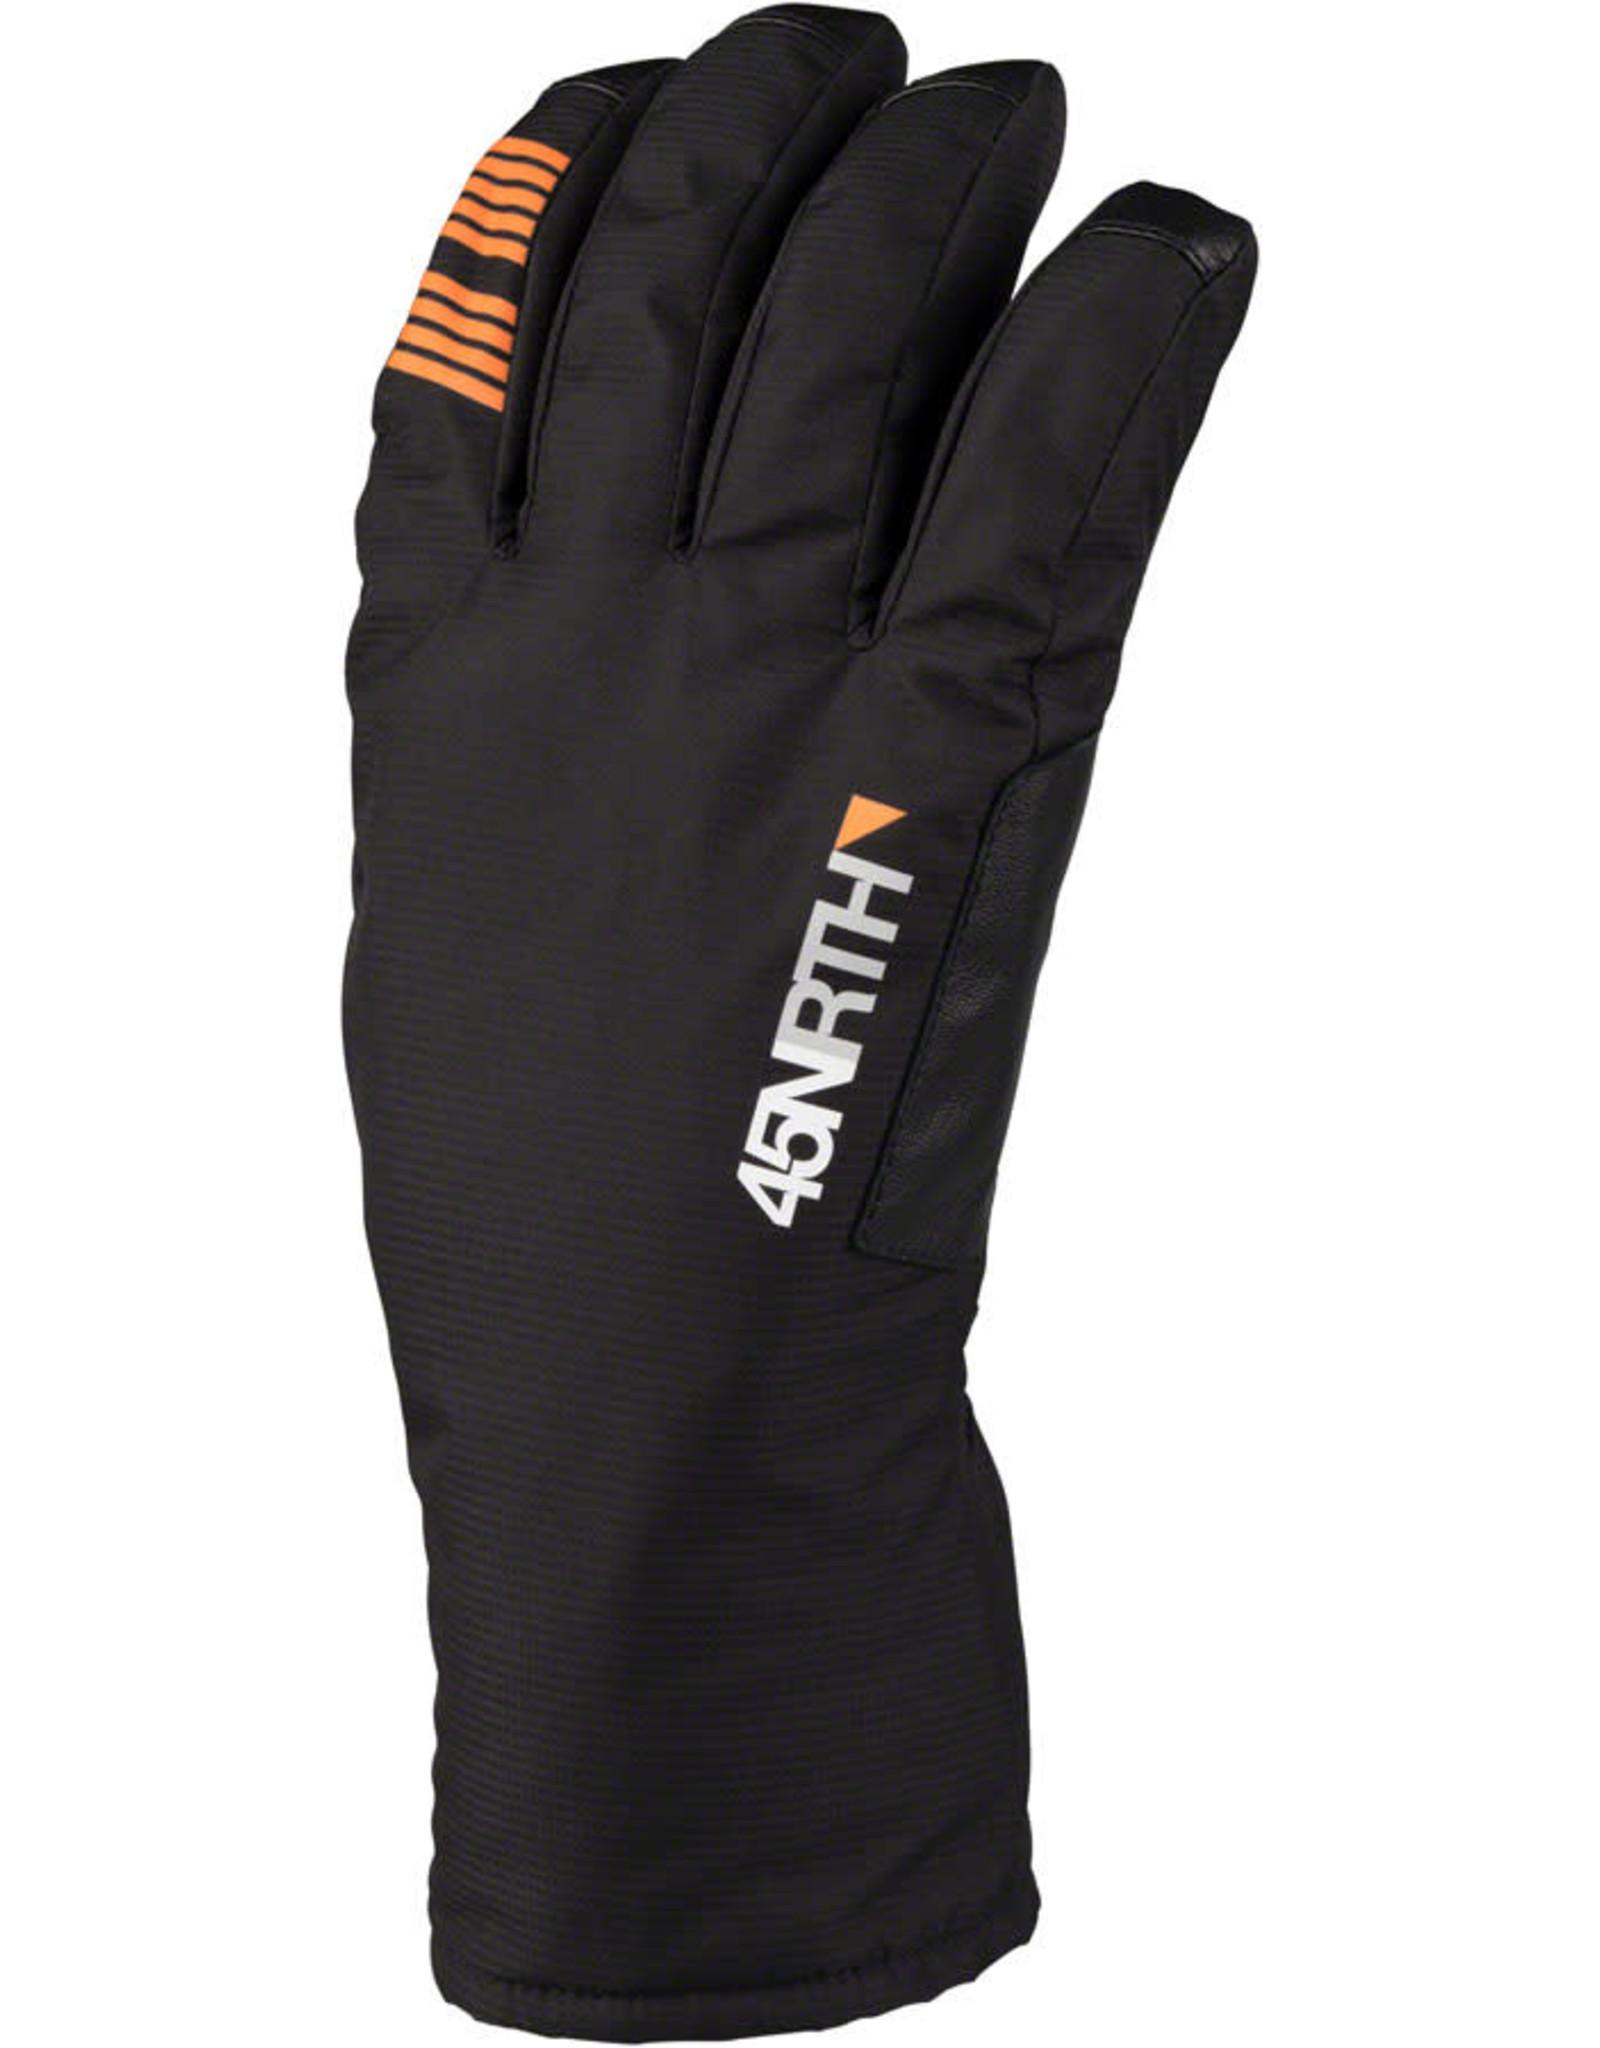 45NRTH 45NRTH Sturmfist 5 Glove